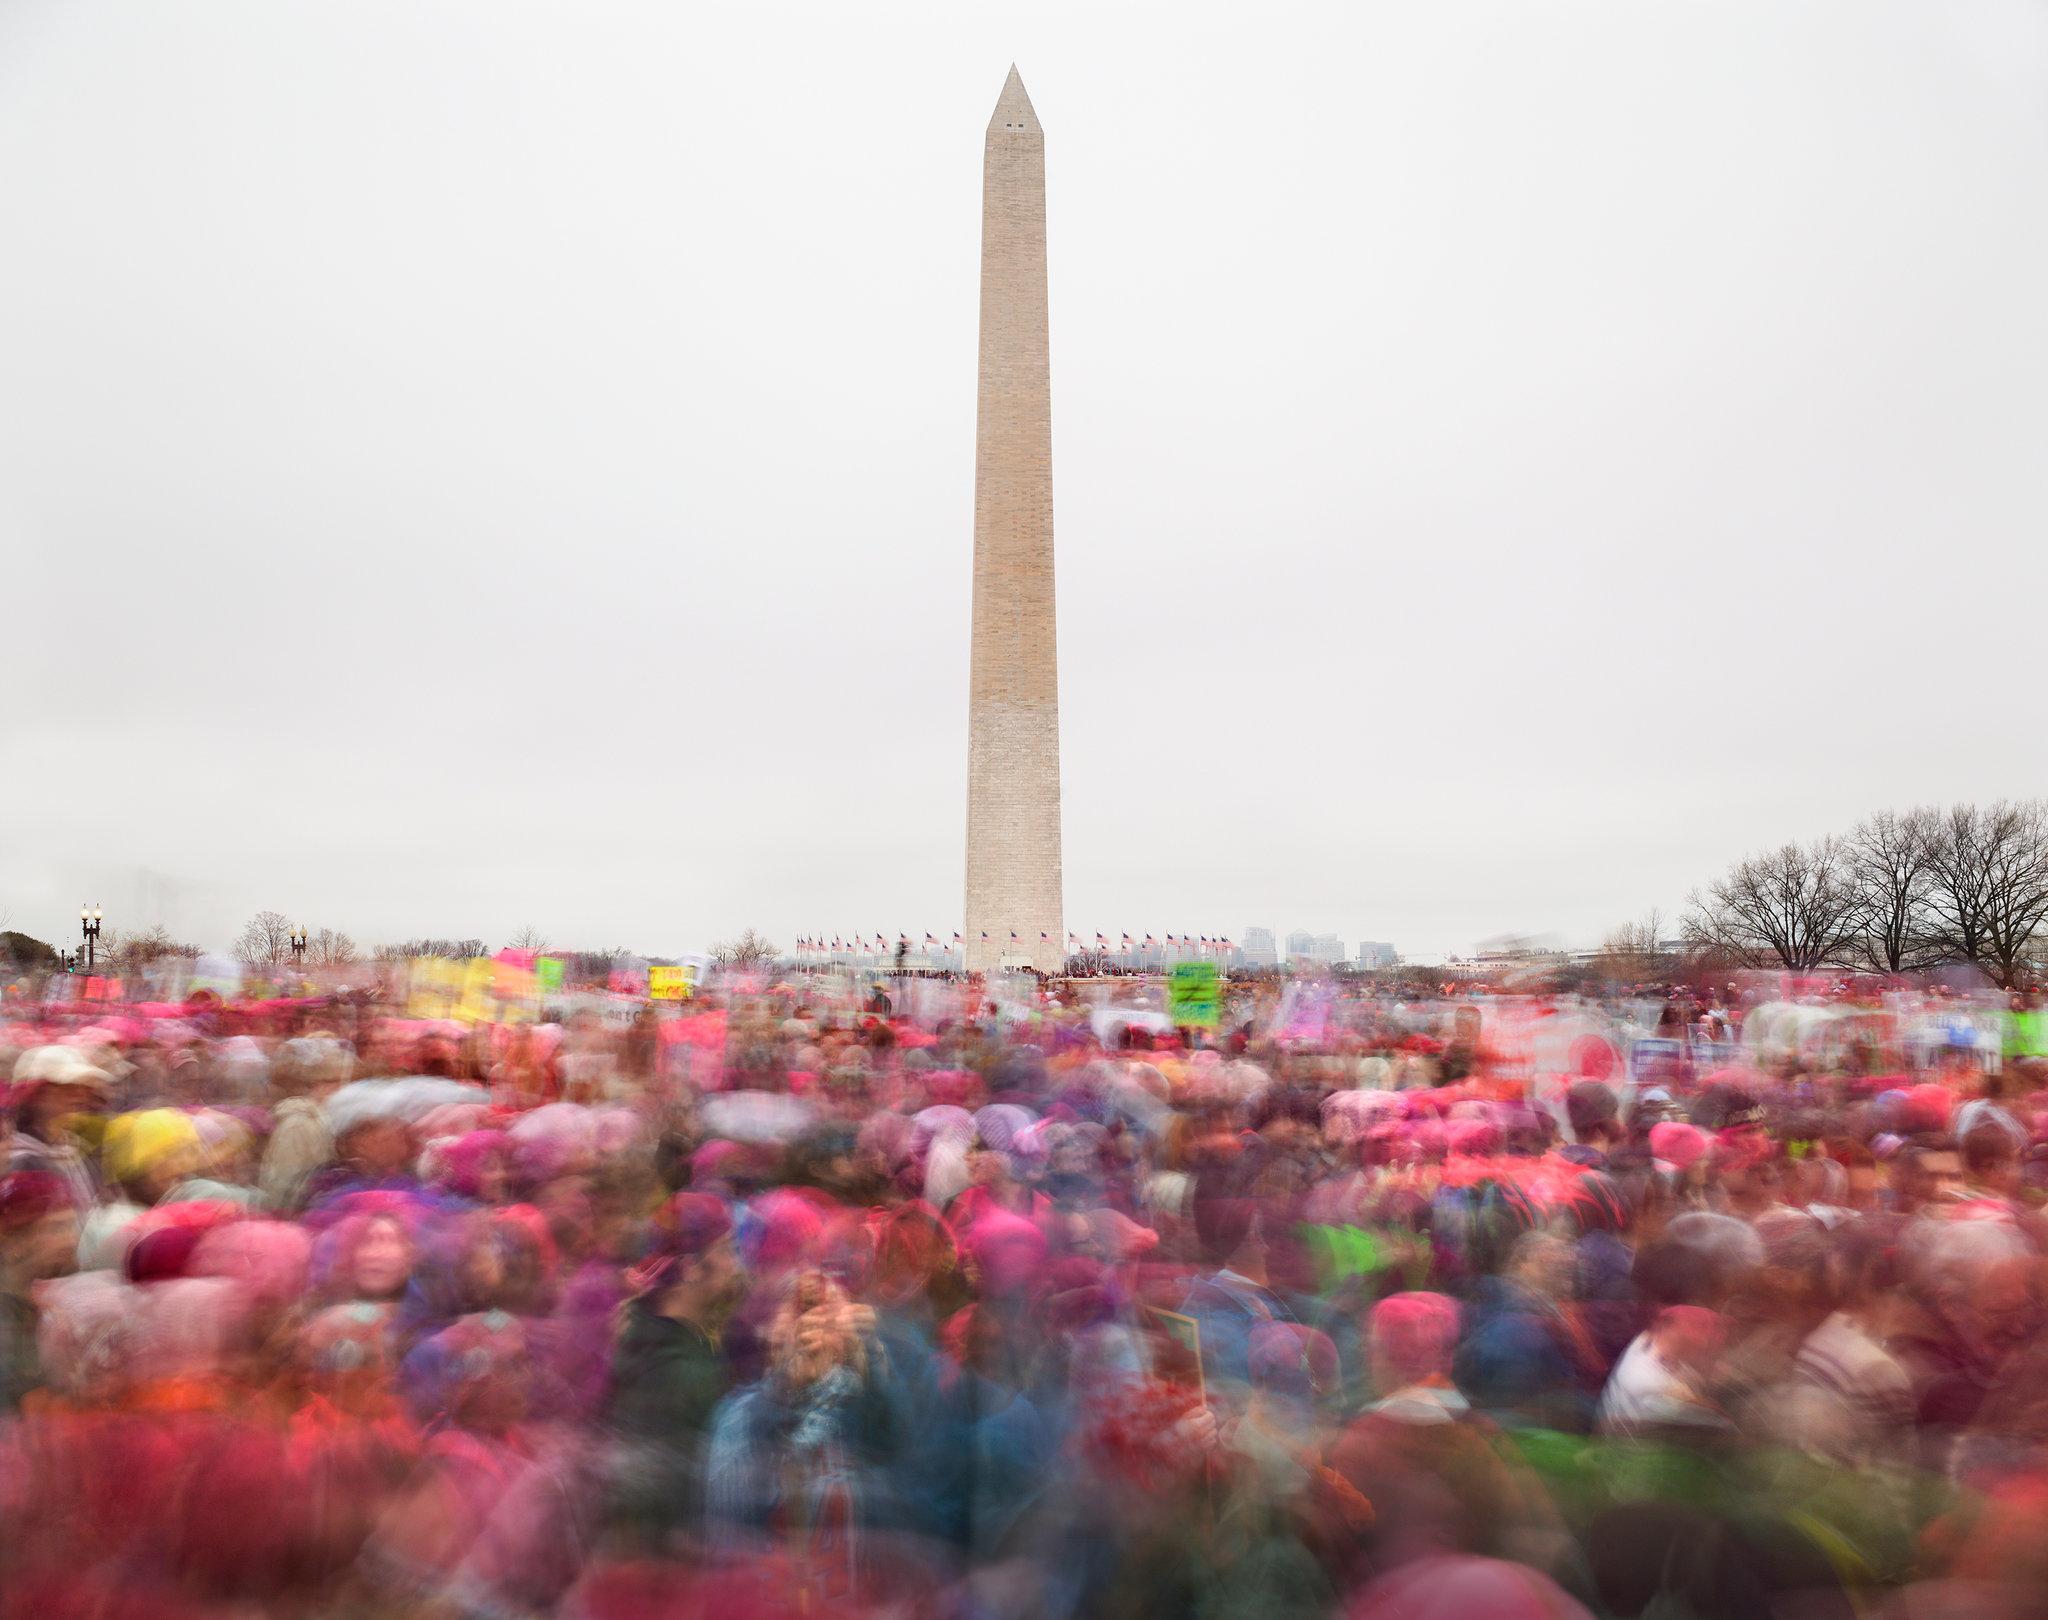 Women's March on Washington, Jan. 21, 2017.CreditMatthew Pillsbury for The New York Times